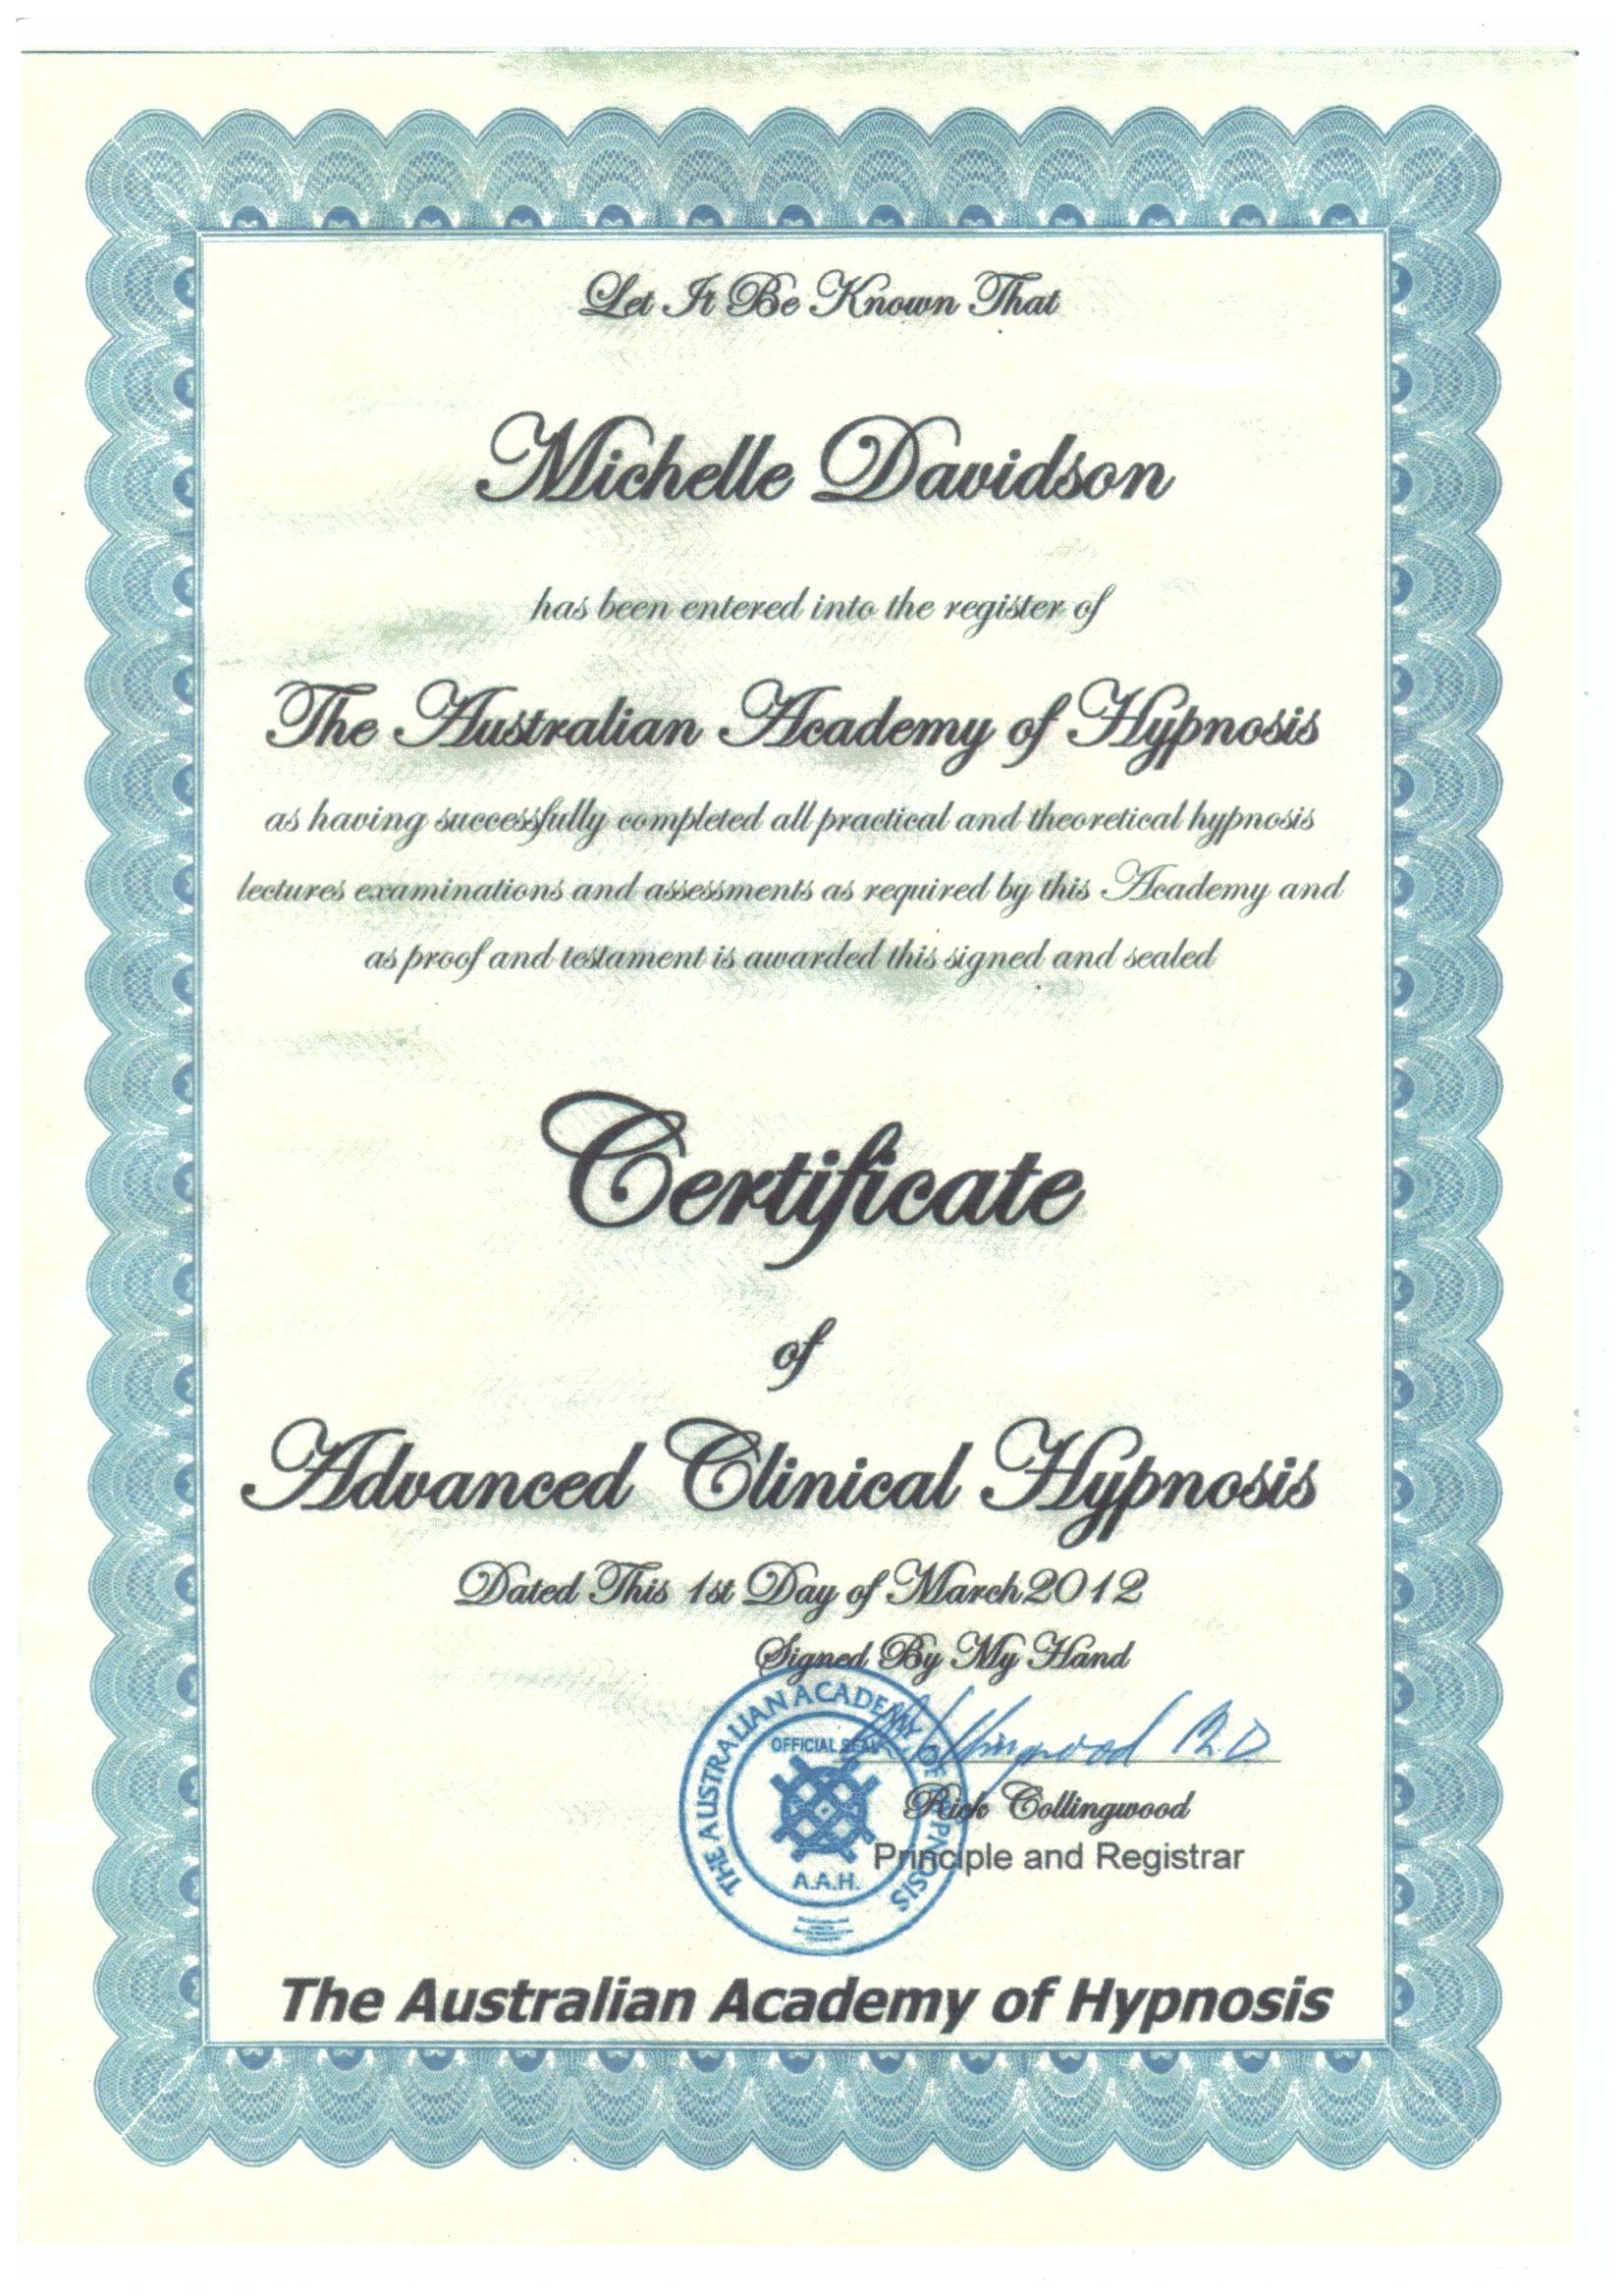 Advanced Clinical Hypnosis 2012